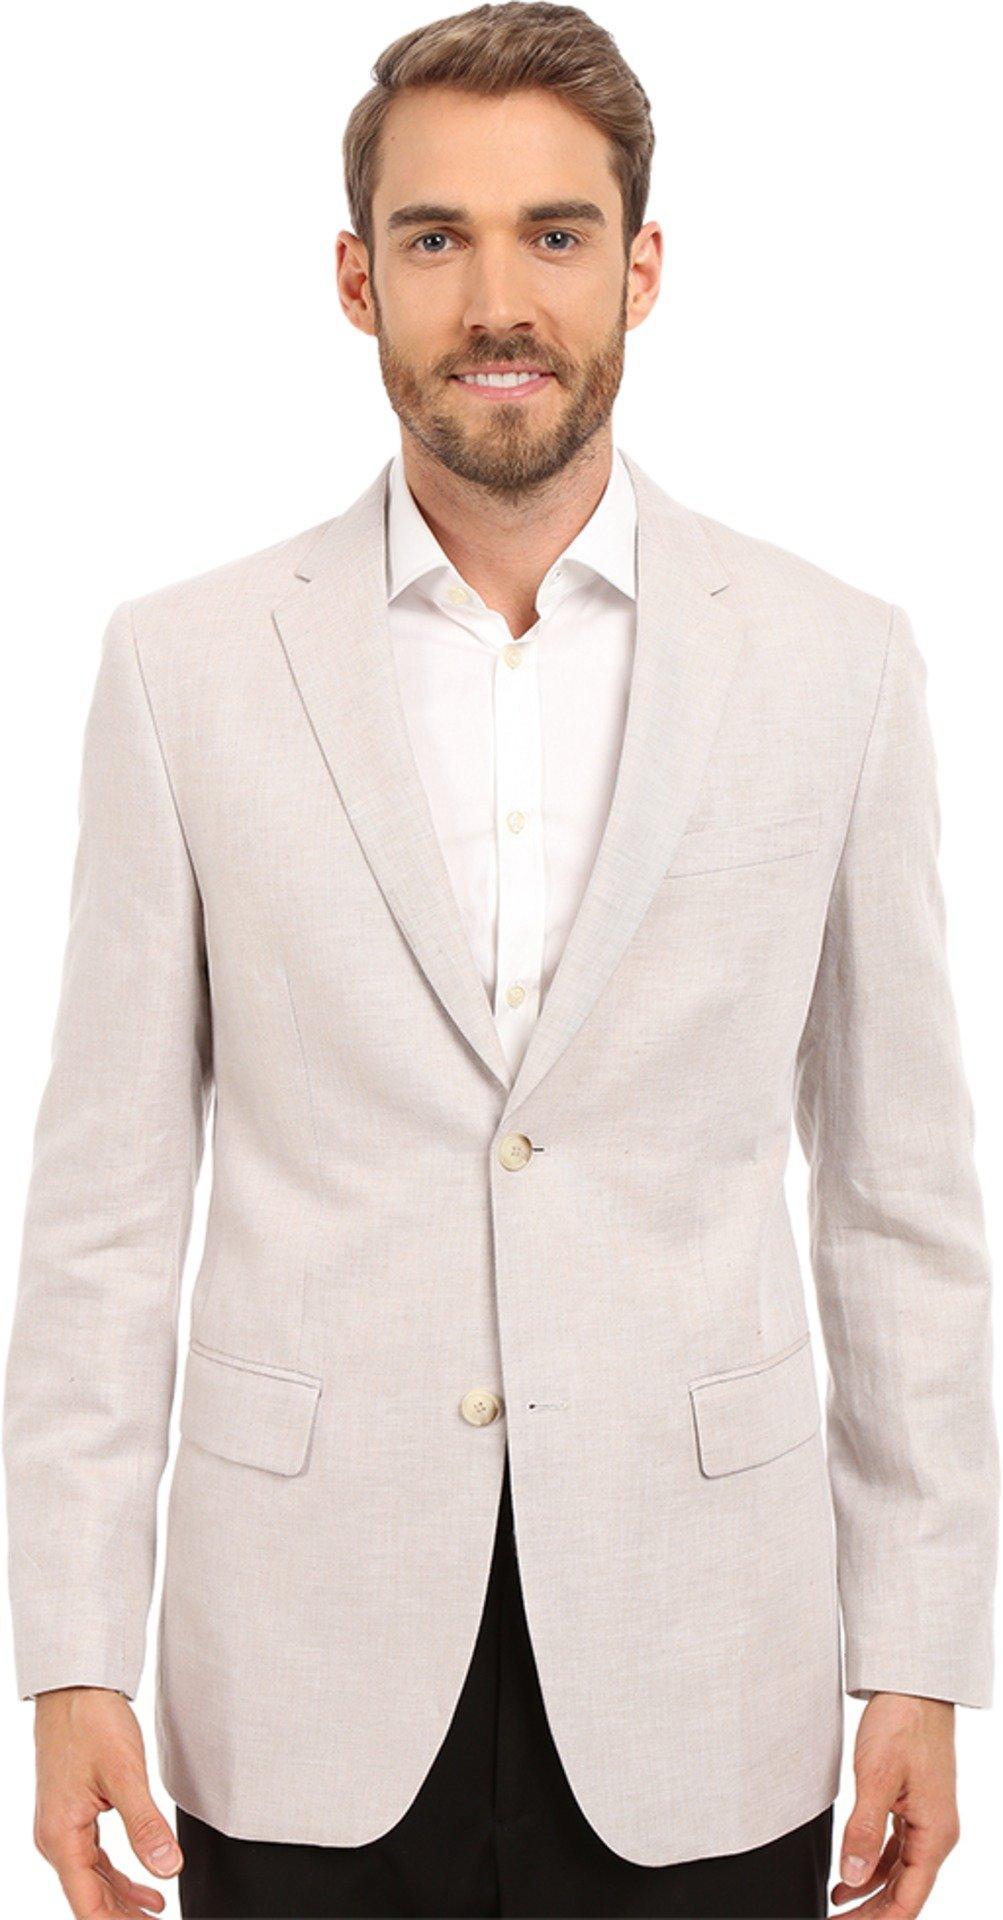 Perry Ellis Men's Linen Suit Jacket Natural Linen Jacket 2XL (46 Regular) by Perry Ellis (Image #1)